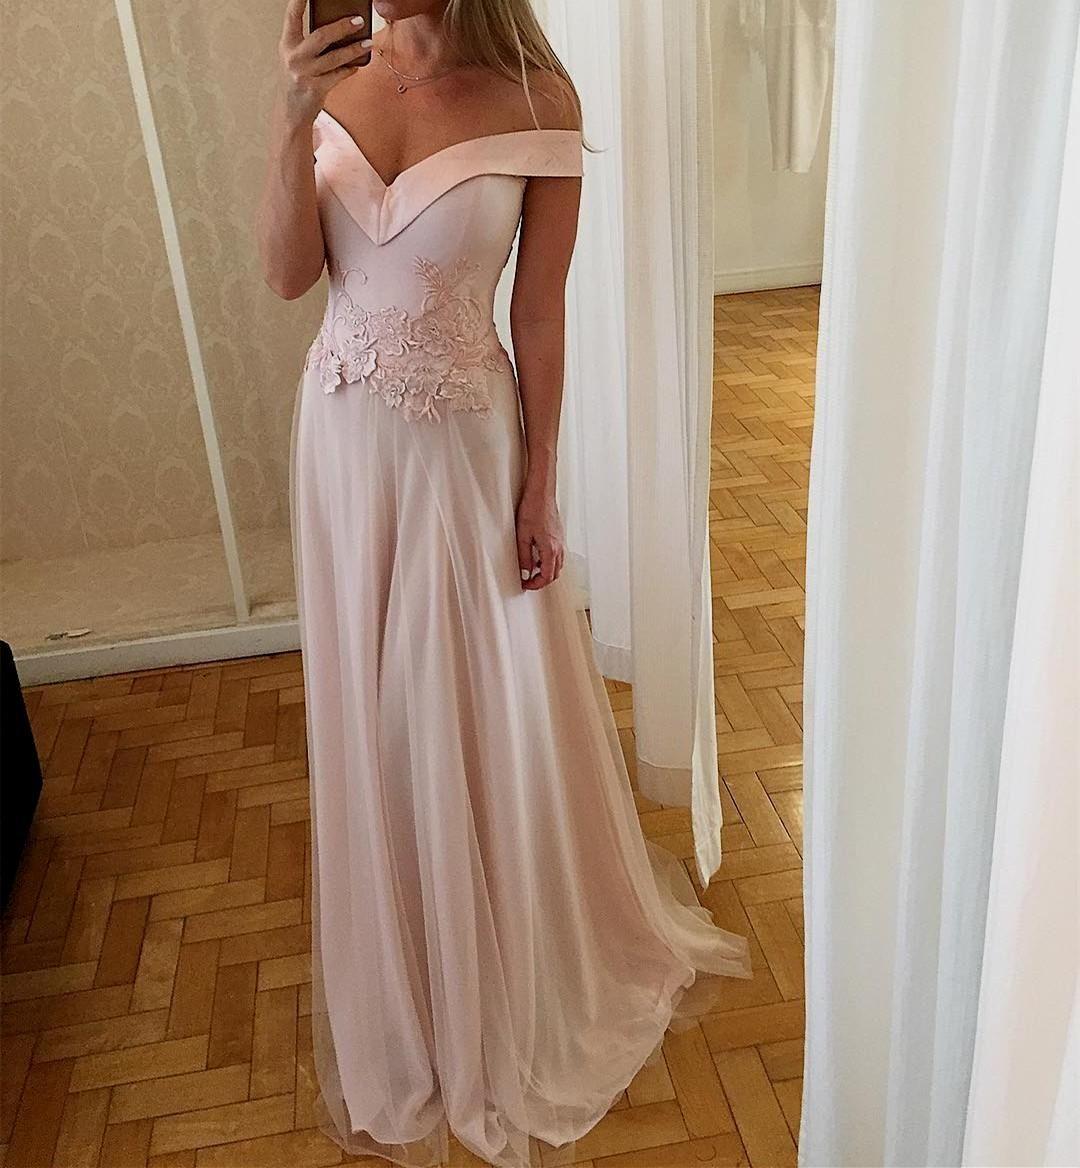 Light pink off the shoulder long prom dresstulle sheath evening